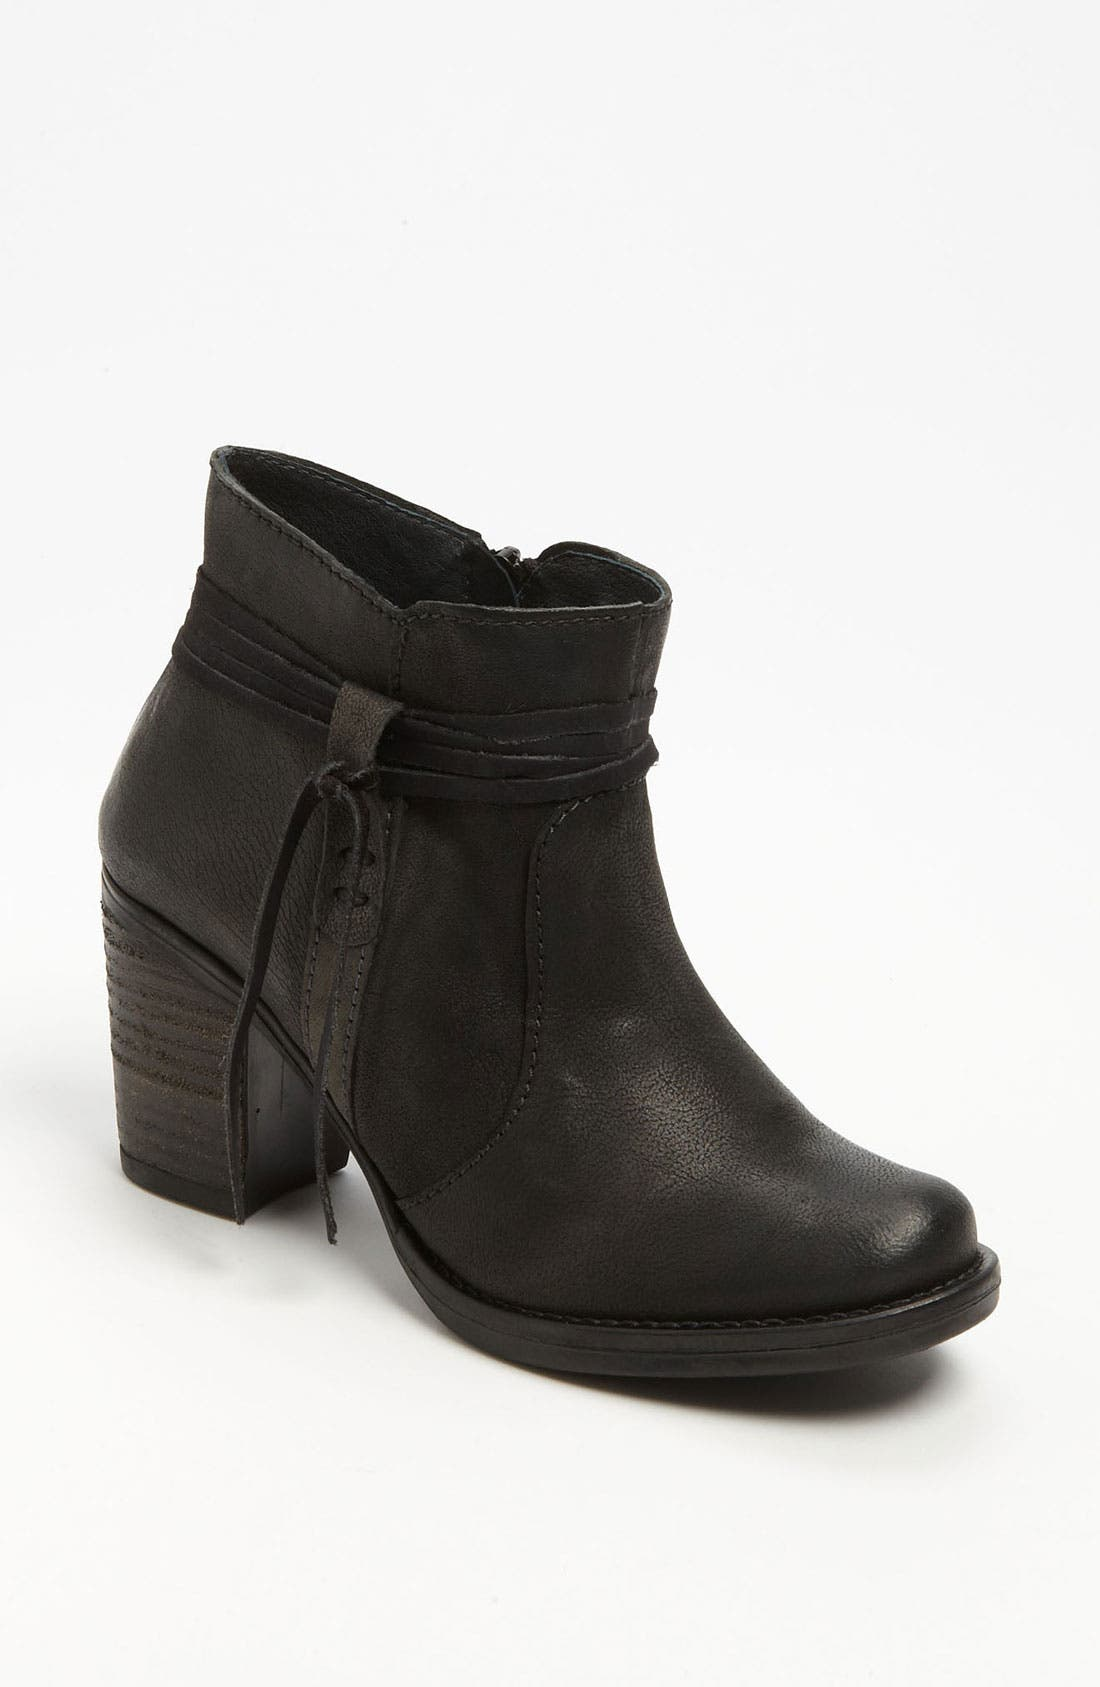 Alternate Image 1 Selected - Miz Mooz 'Melba' Boot